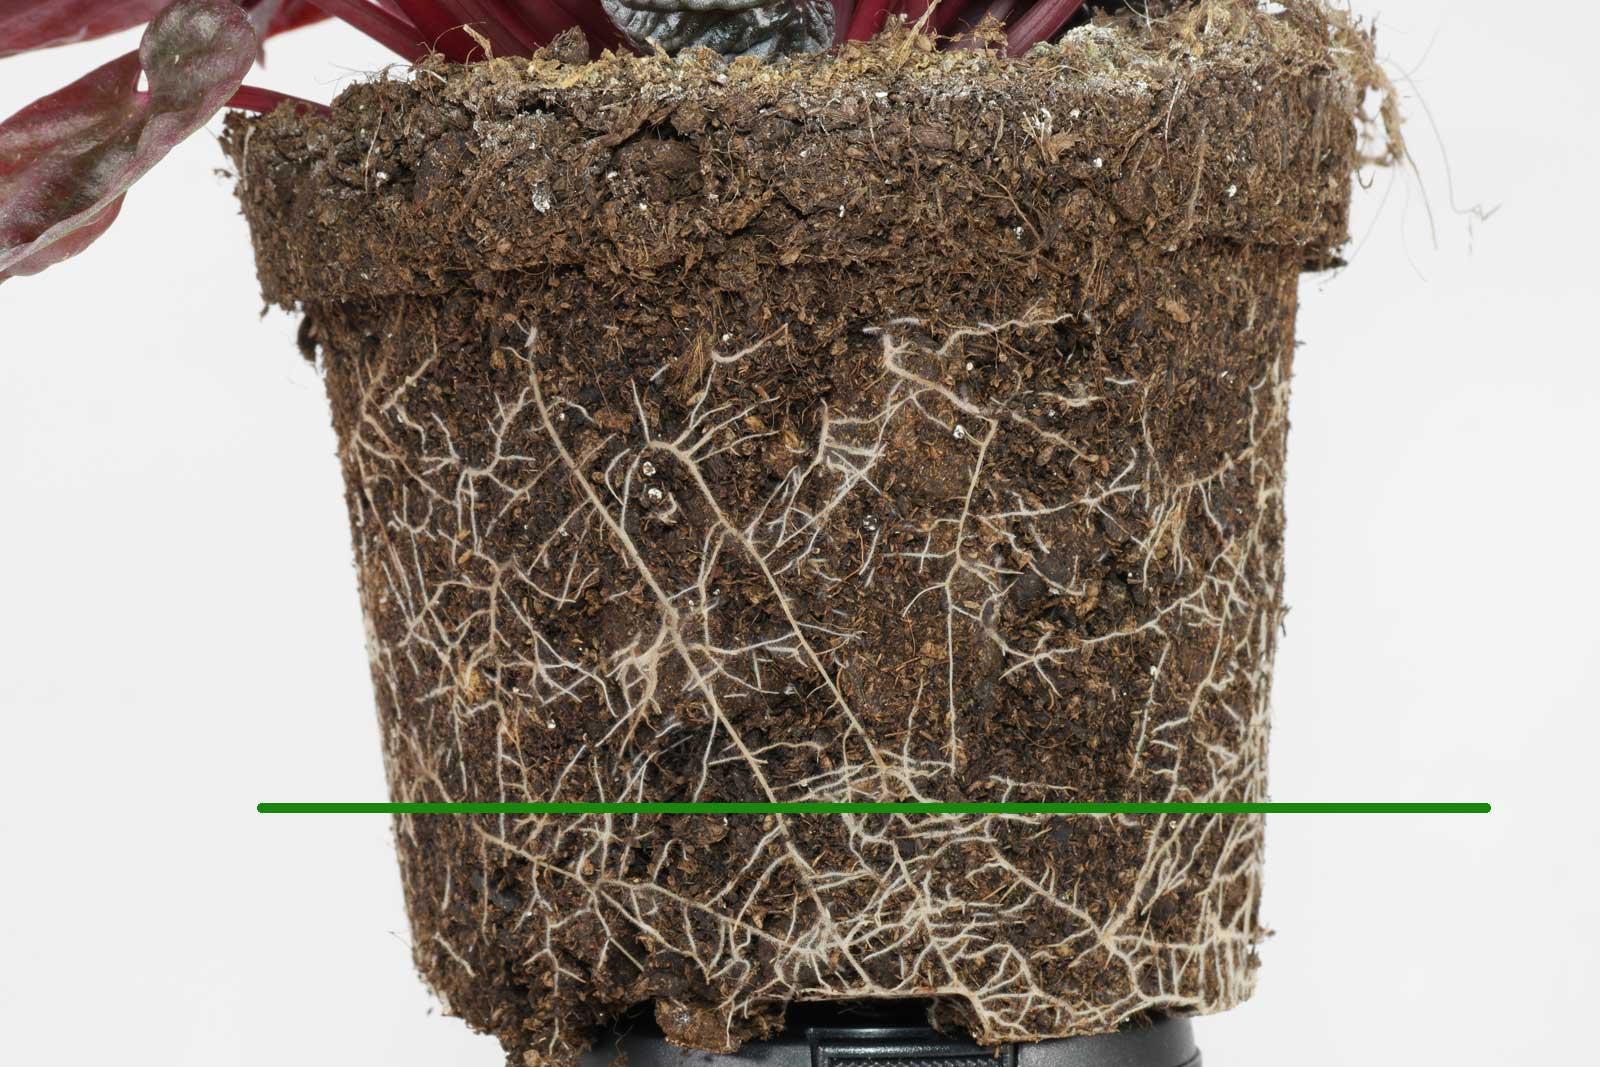 Peperomia caperata roots